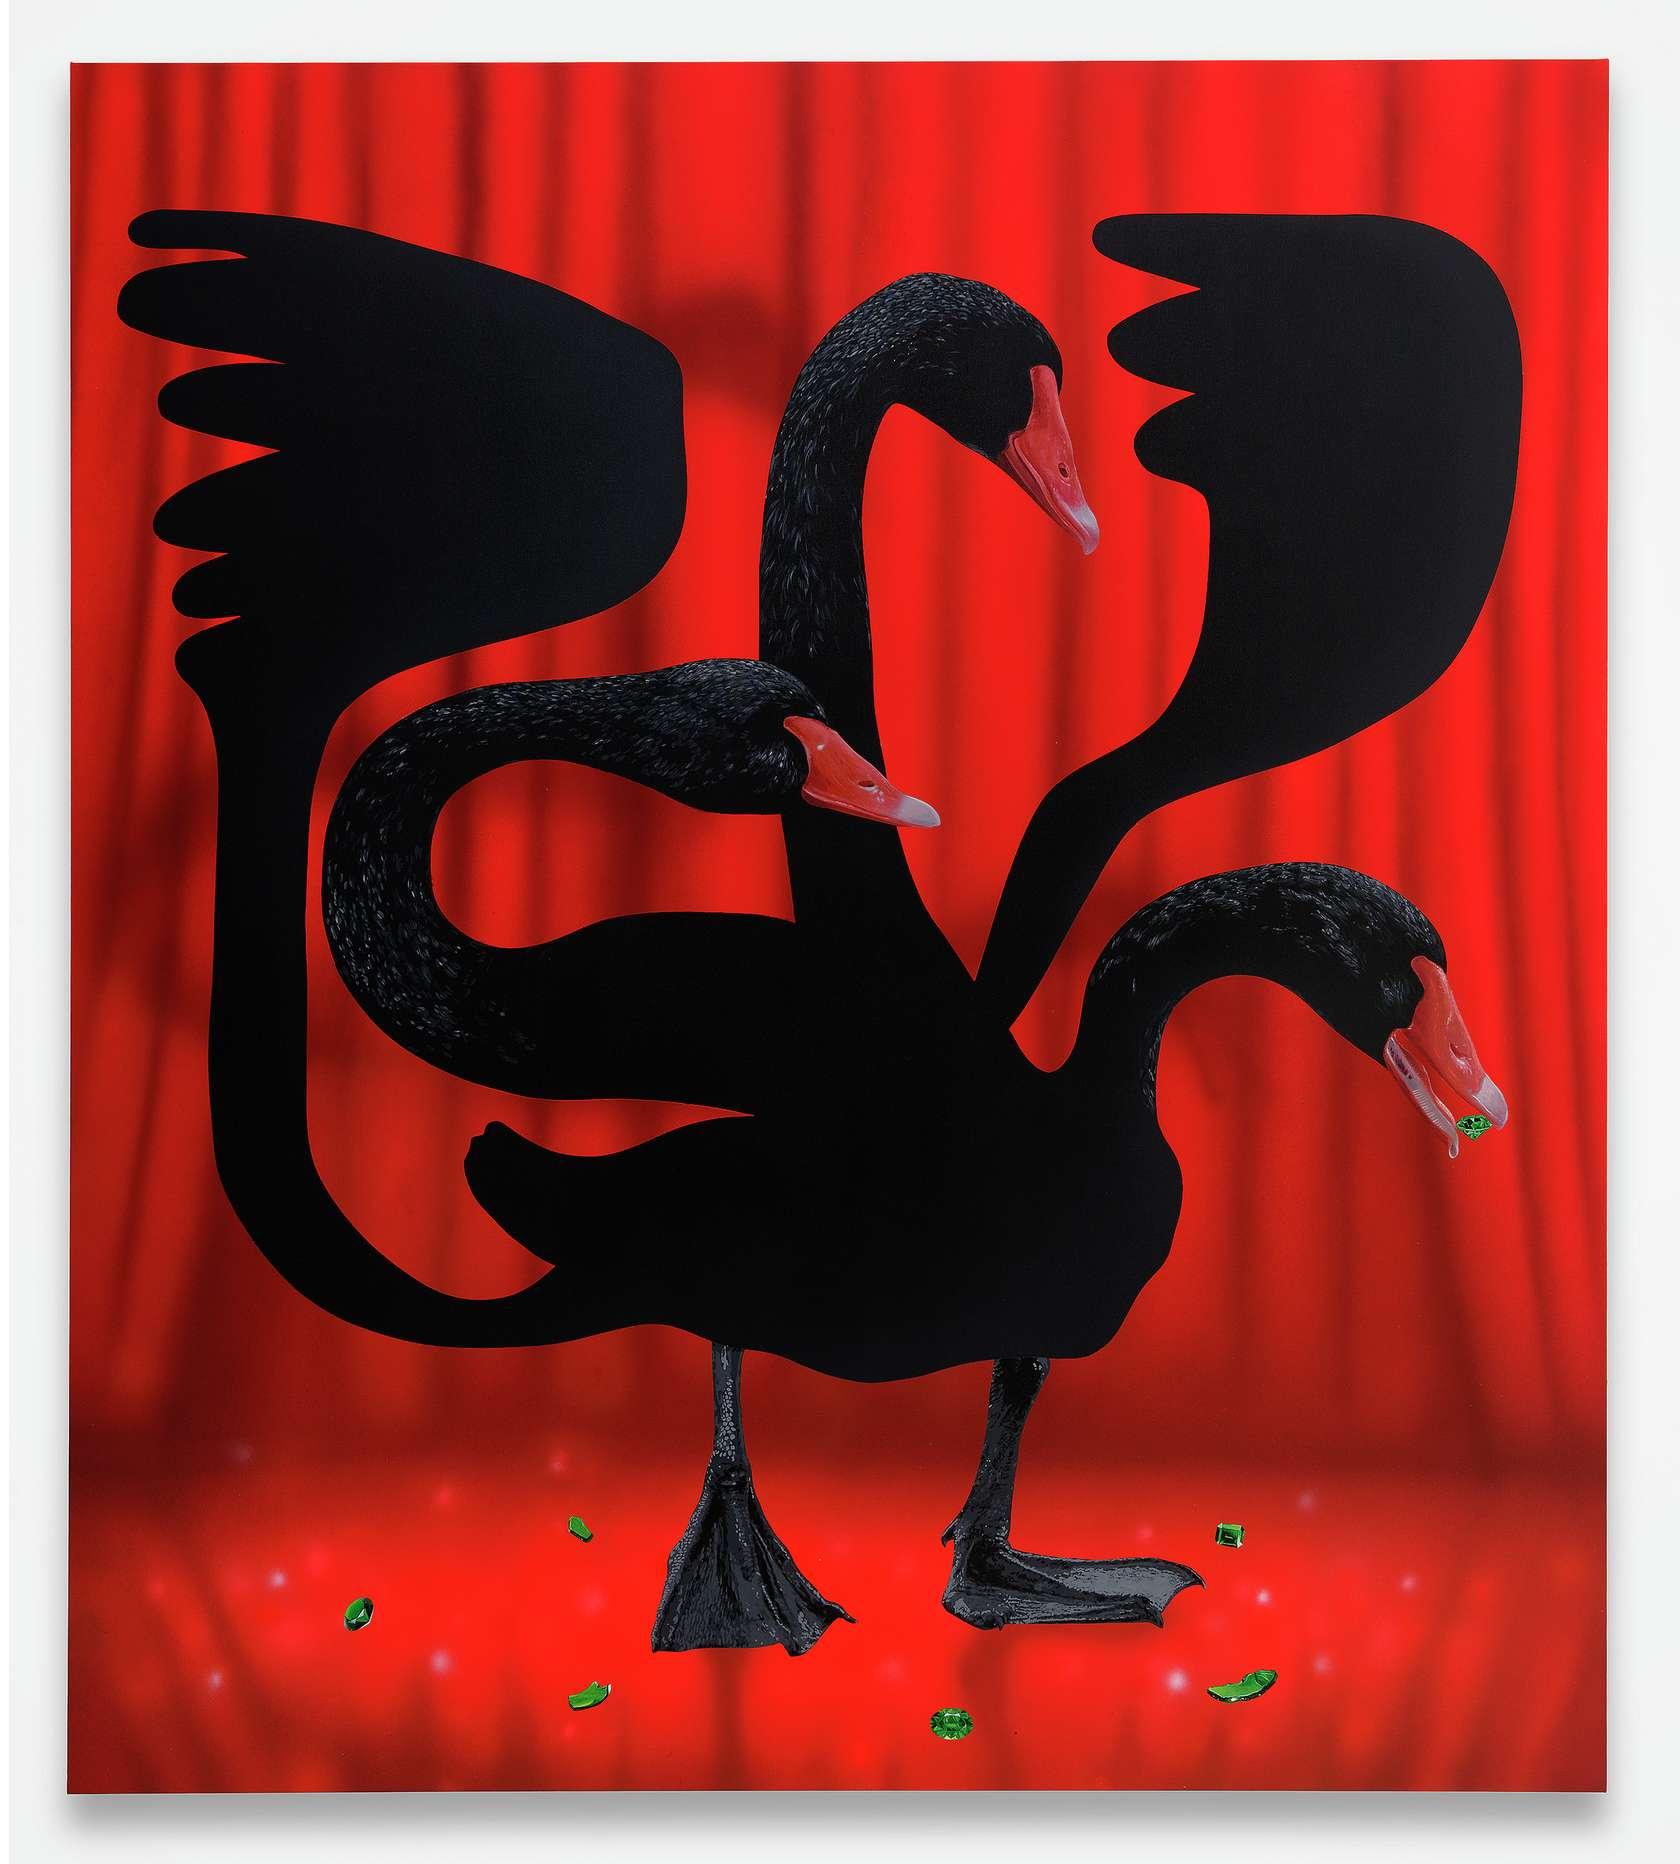 Oli Epp, Omen, 2020 Huile et acrylique sur toile180 × 160 cm / 70 7/8 × 63  in.